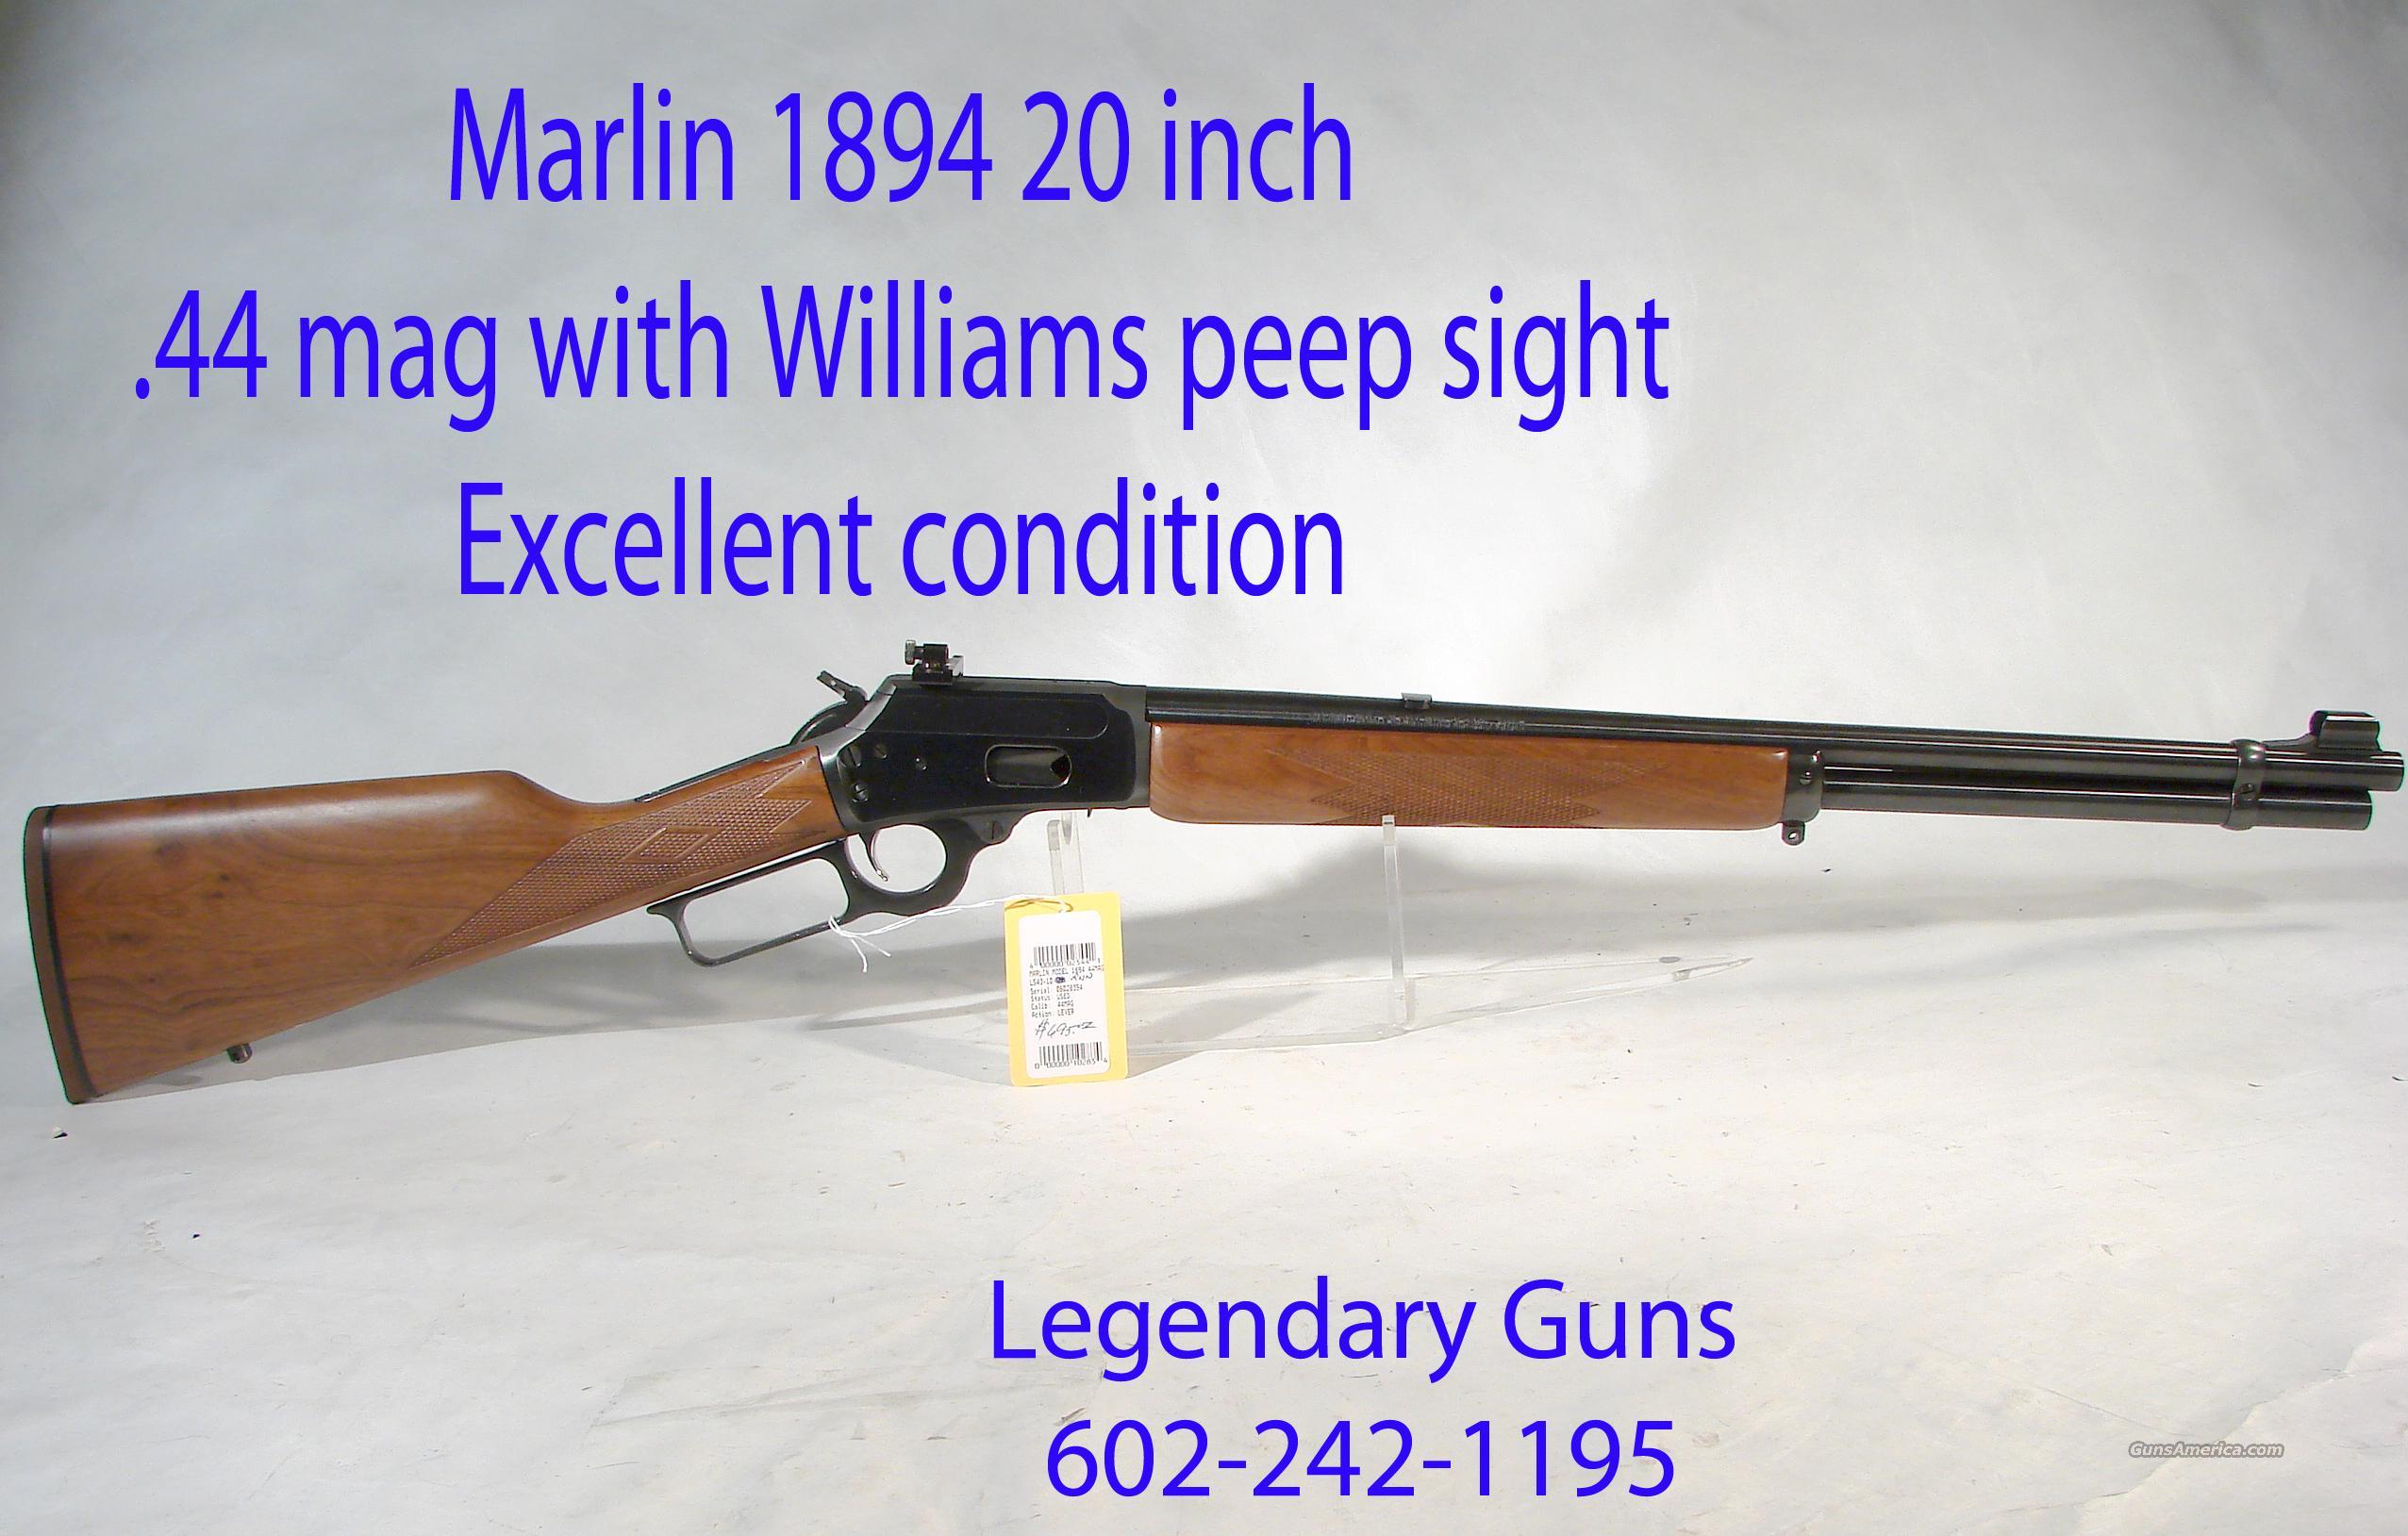 Marlin 1894 20 inch round bbl,  44 mag,